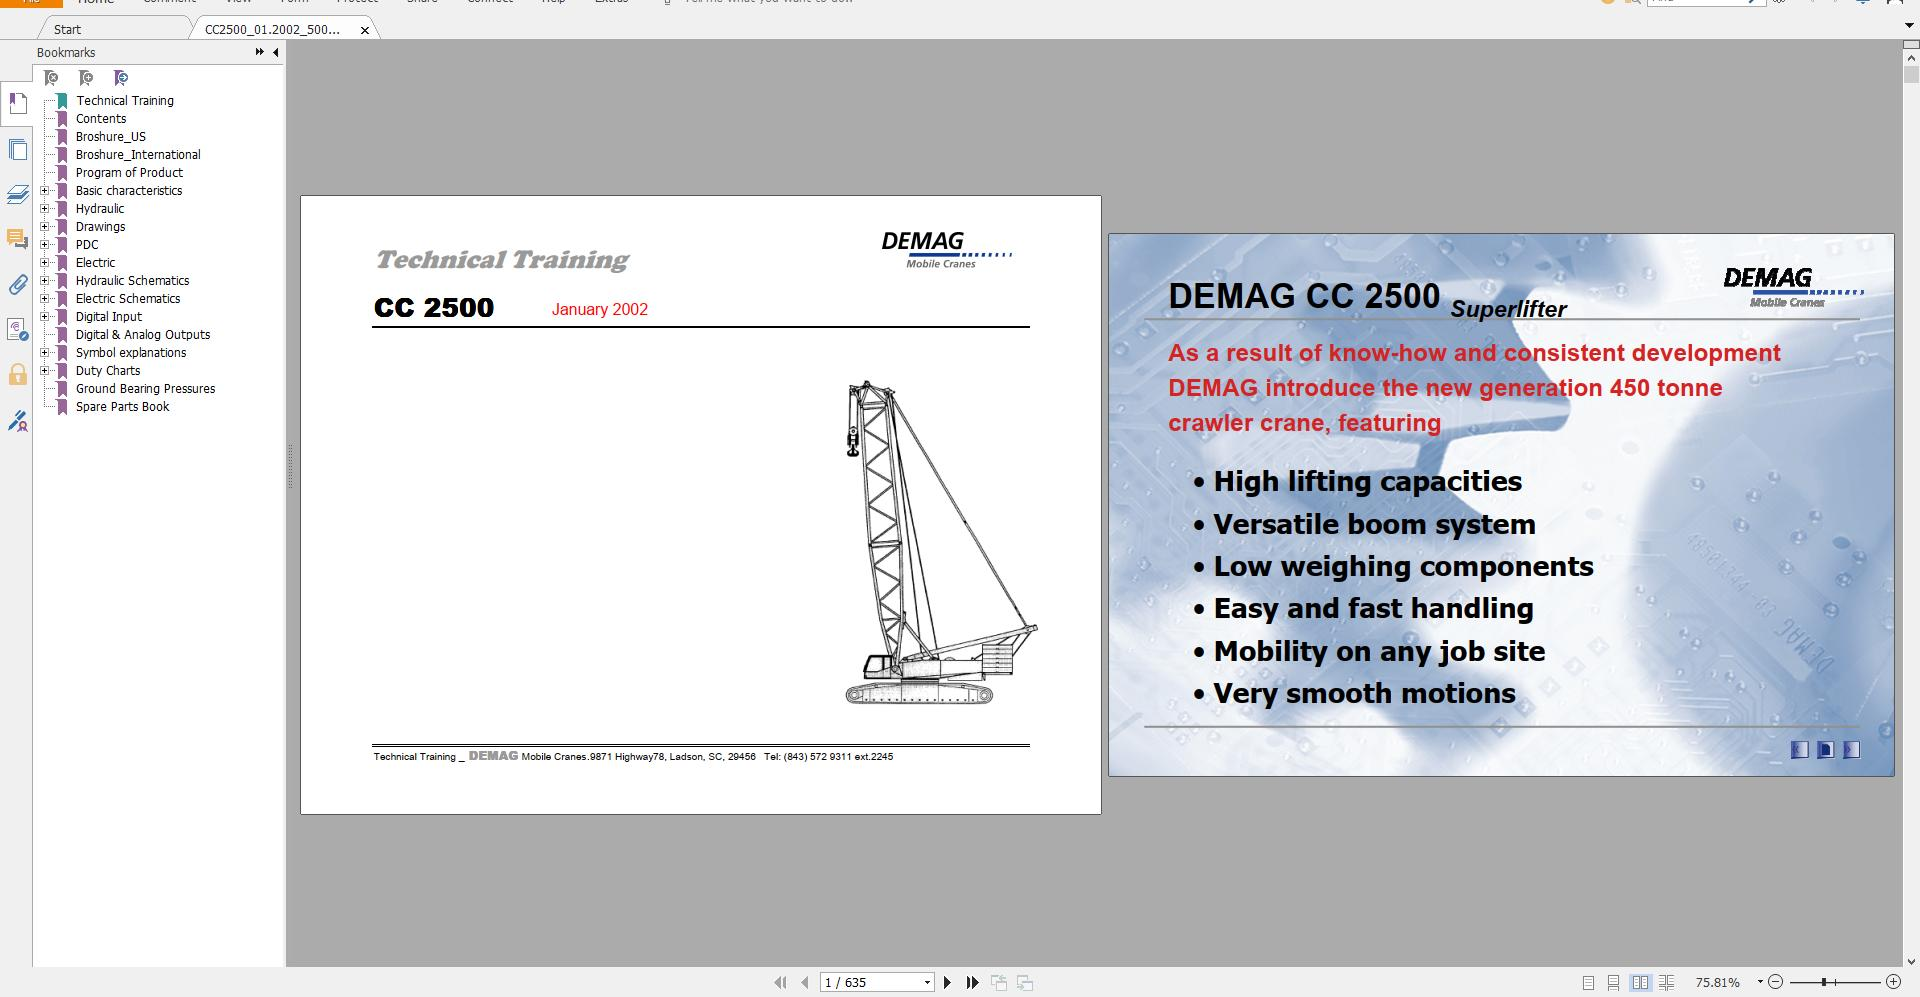 Terex Demag Crawler Crane 250-1250t Technical Service Training Manual Diagram - Homepage